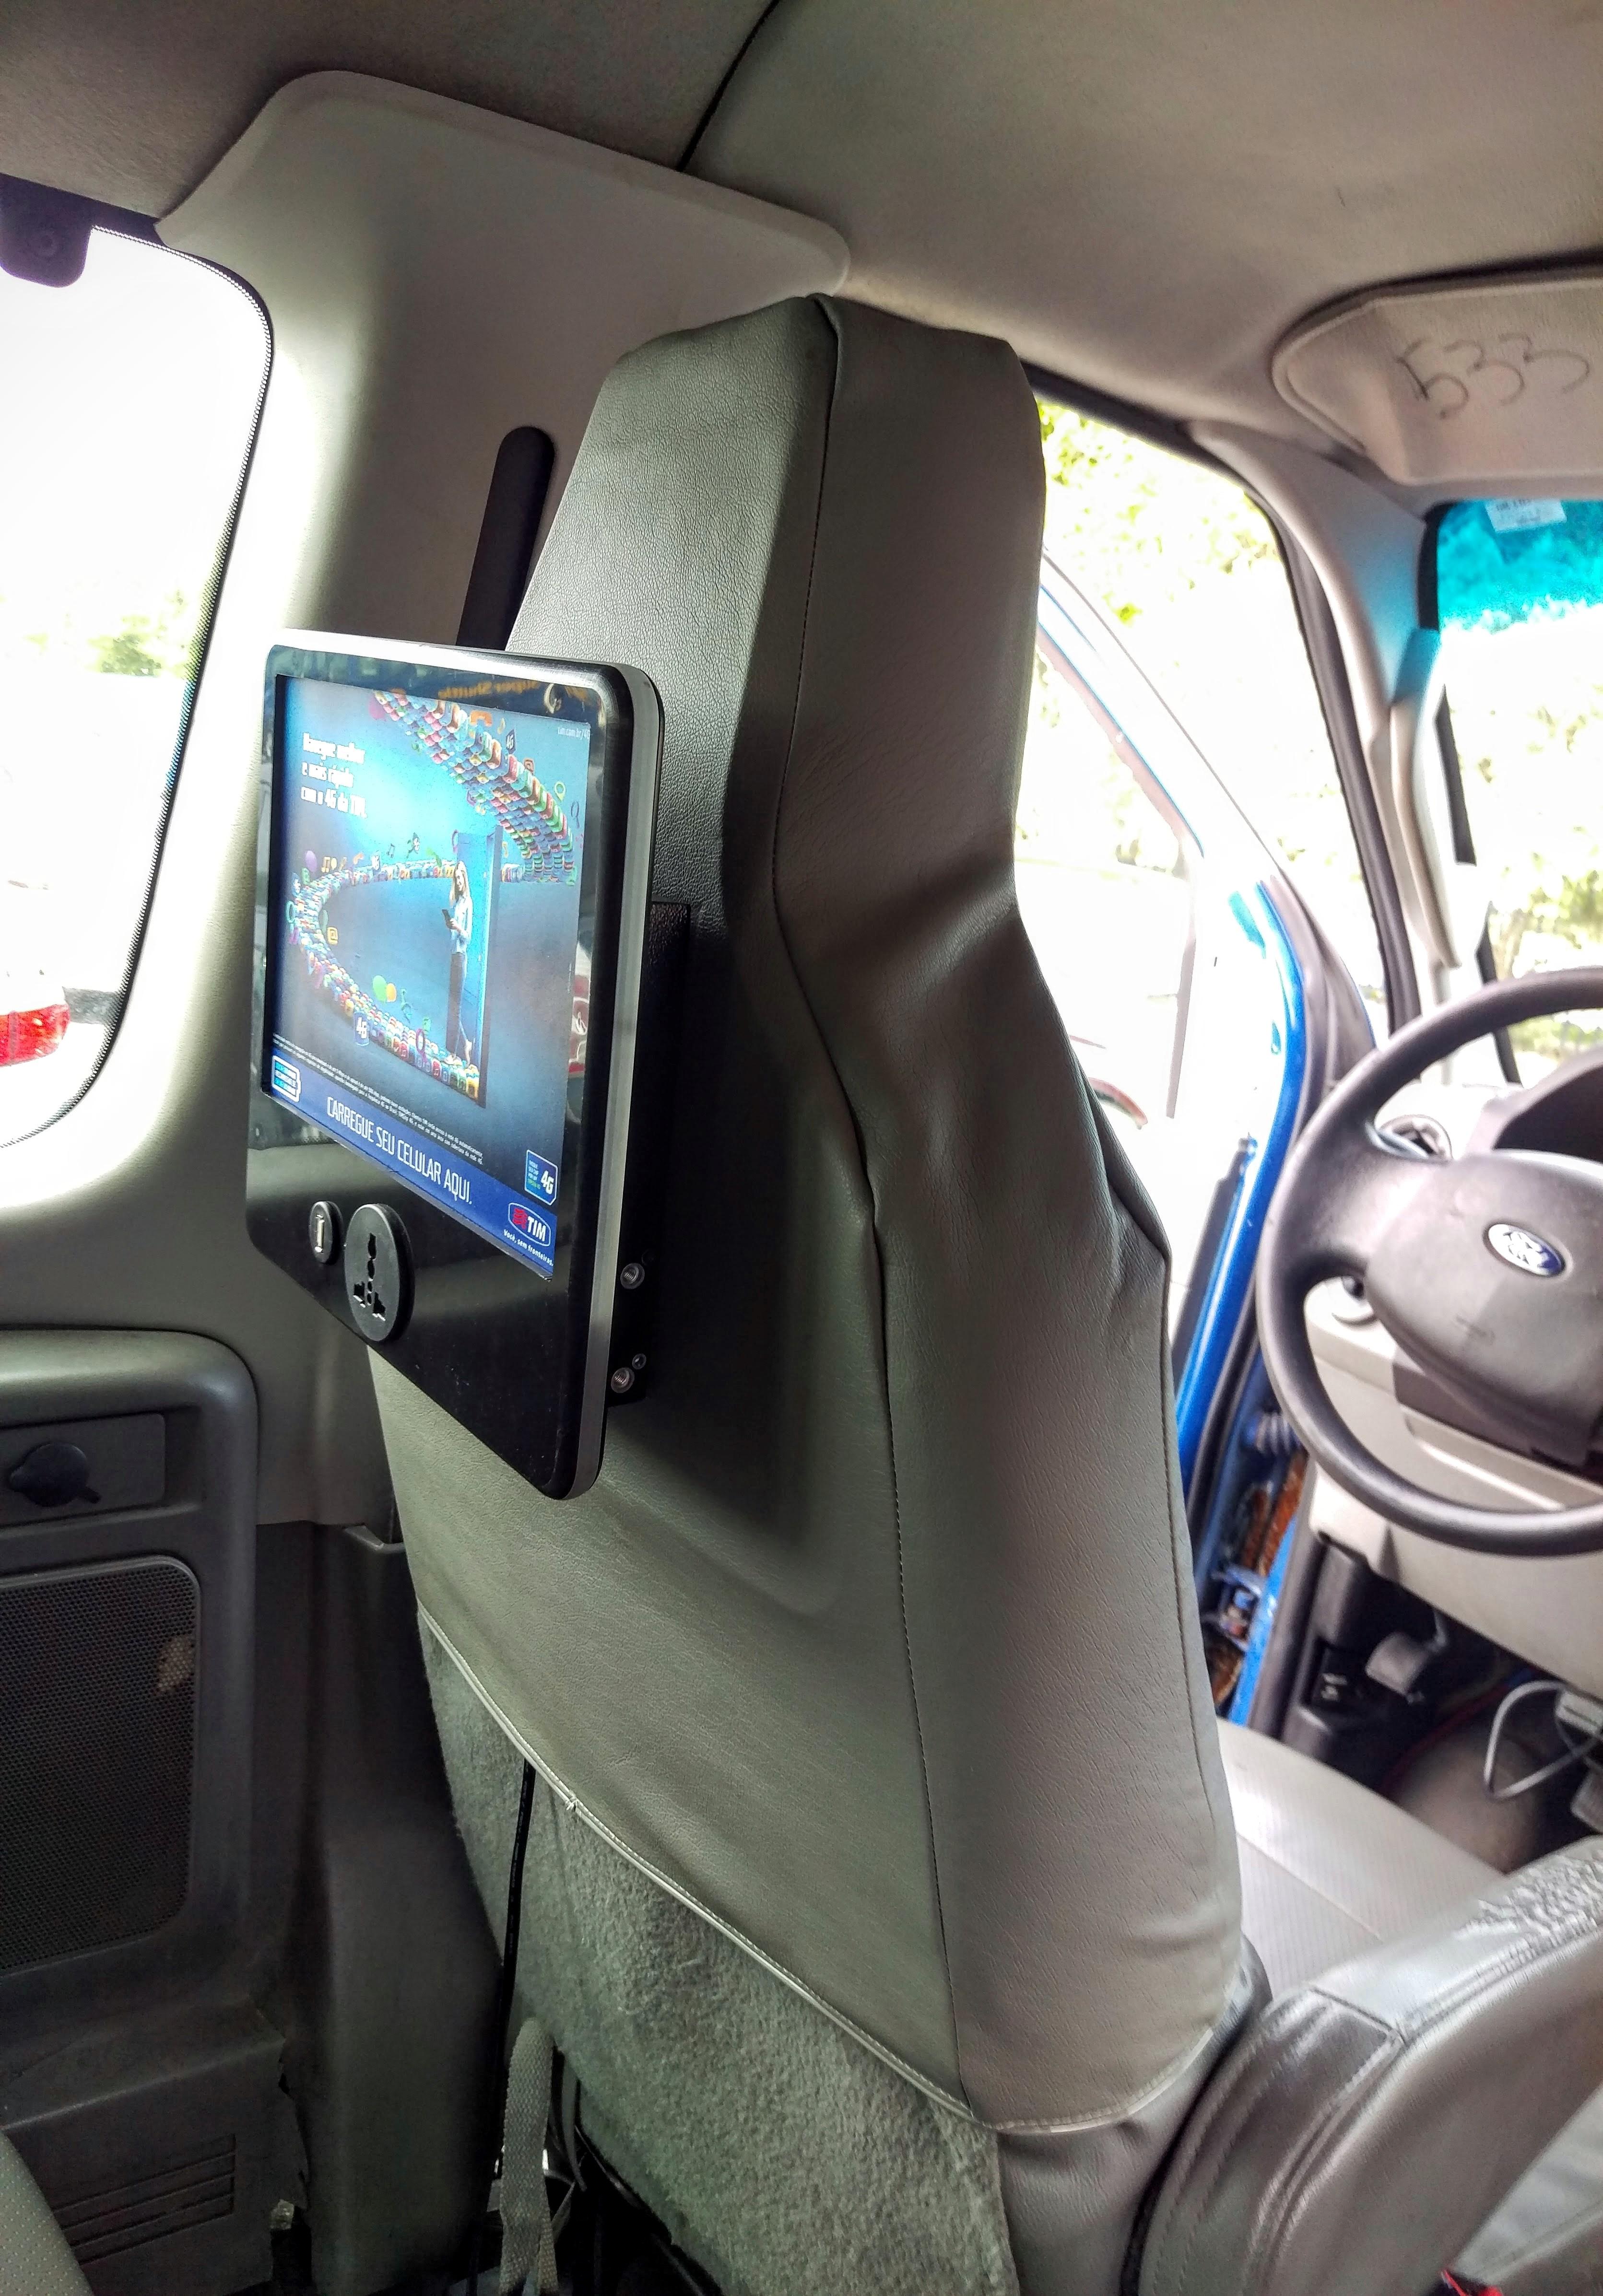 In shuttle CCTV advertisement